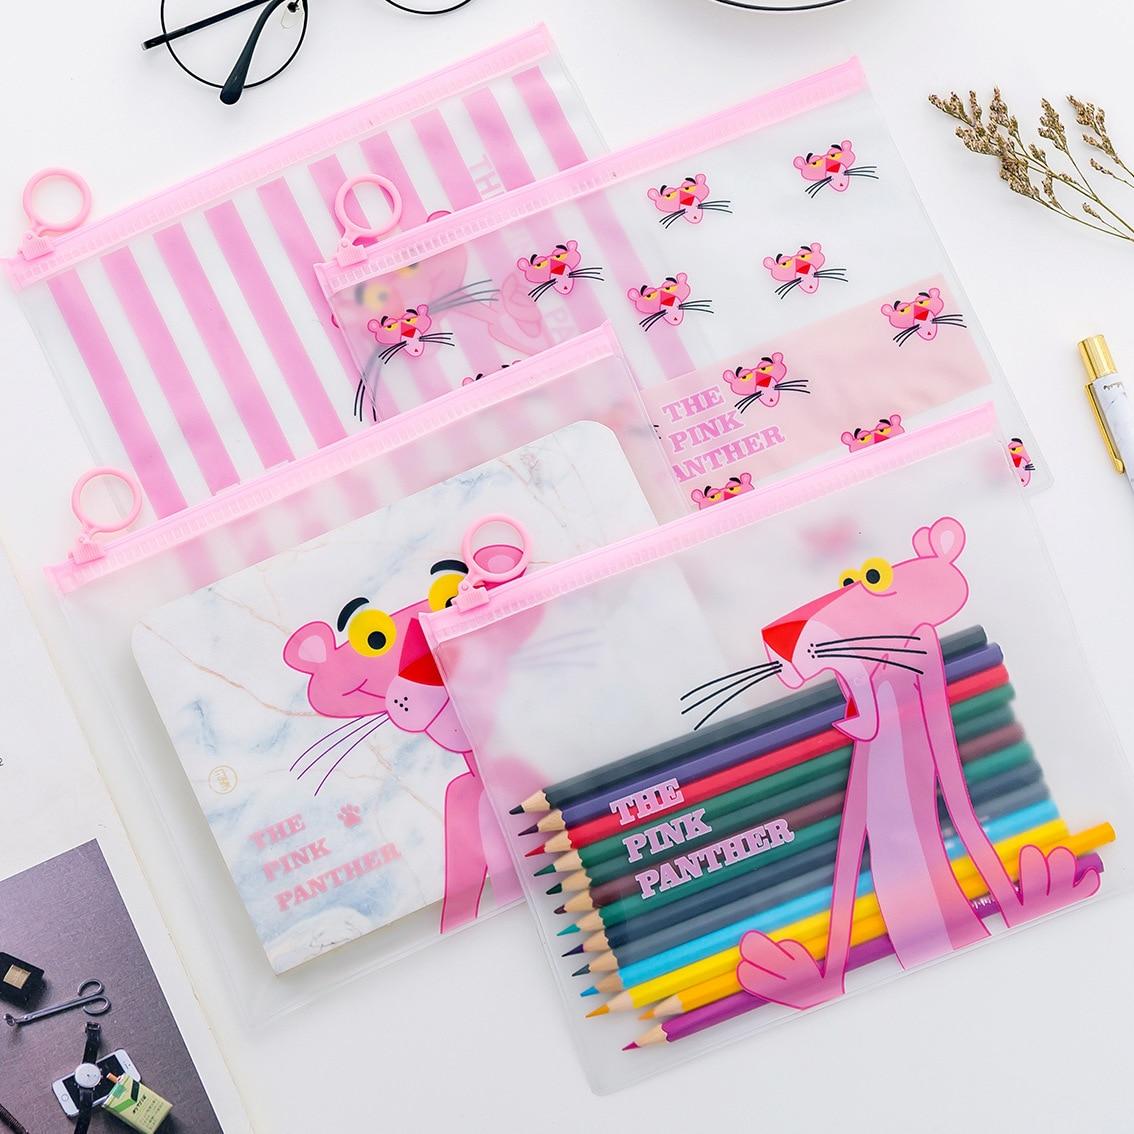 Creative Pink Leopard Transparent PVC Document Bag File Folder Stationery Organizer